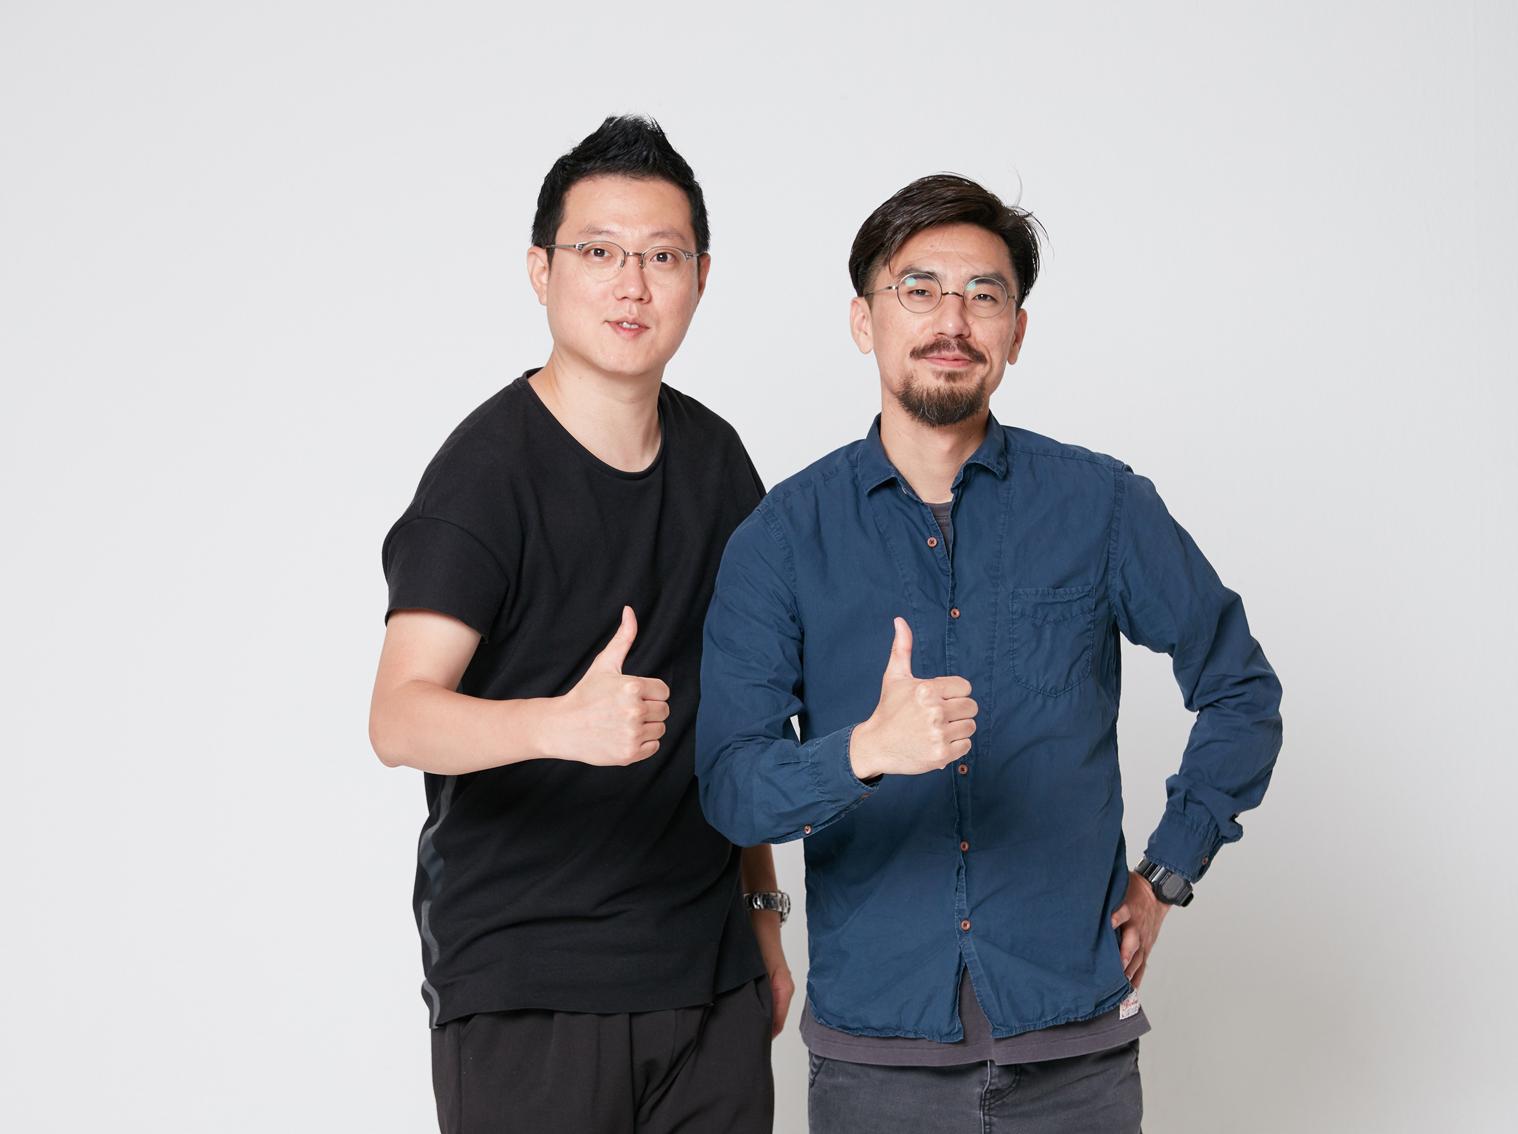 Hot Creative Teams: Cheil Worldwide's Hyungkyun Oh and Seongphil Hwang